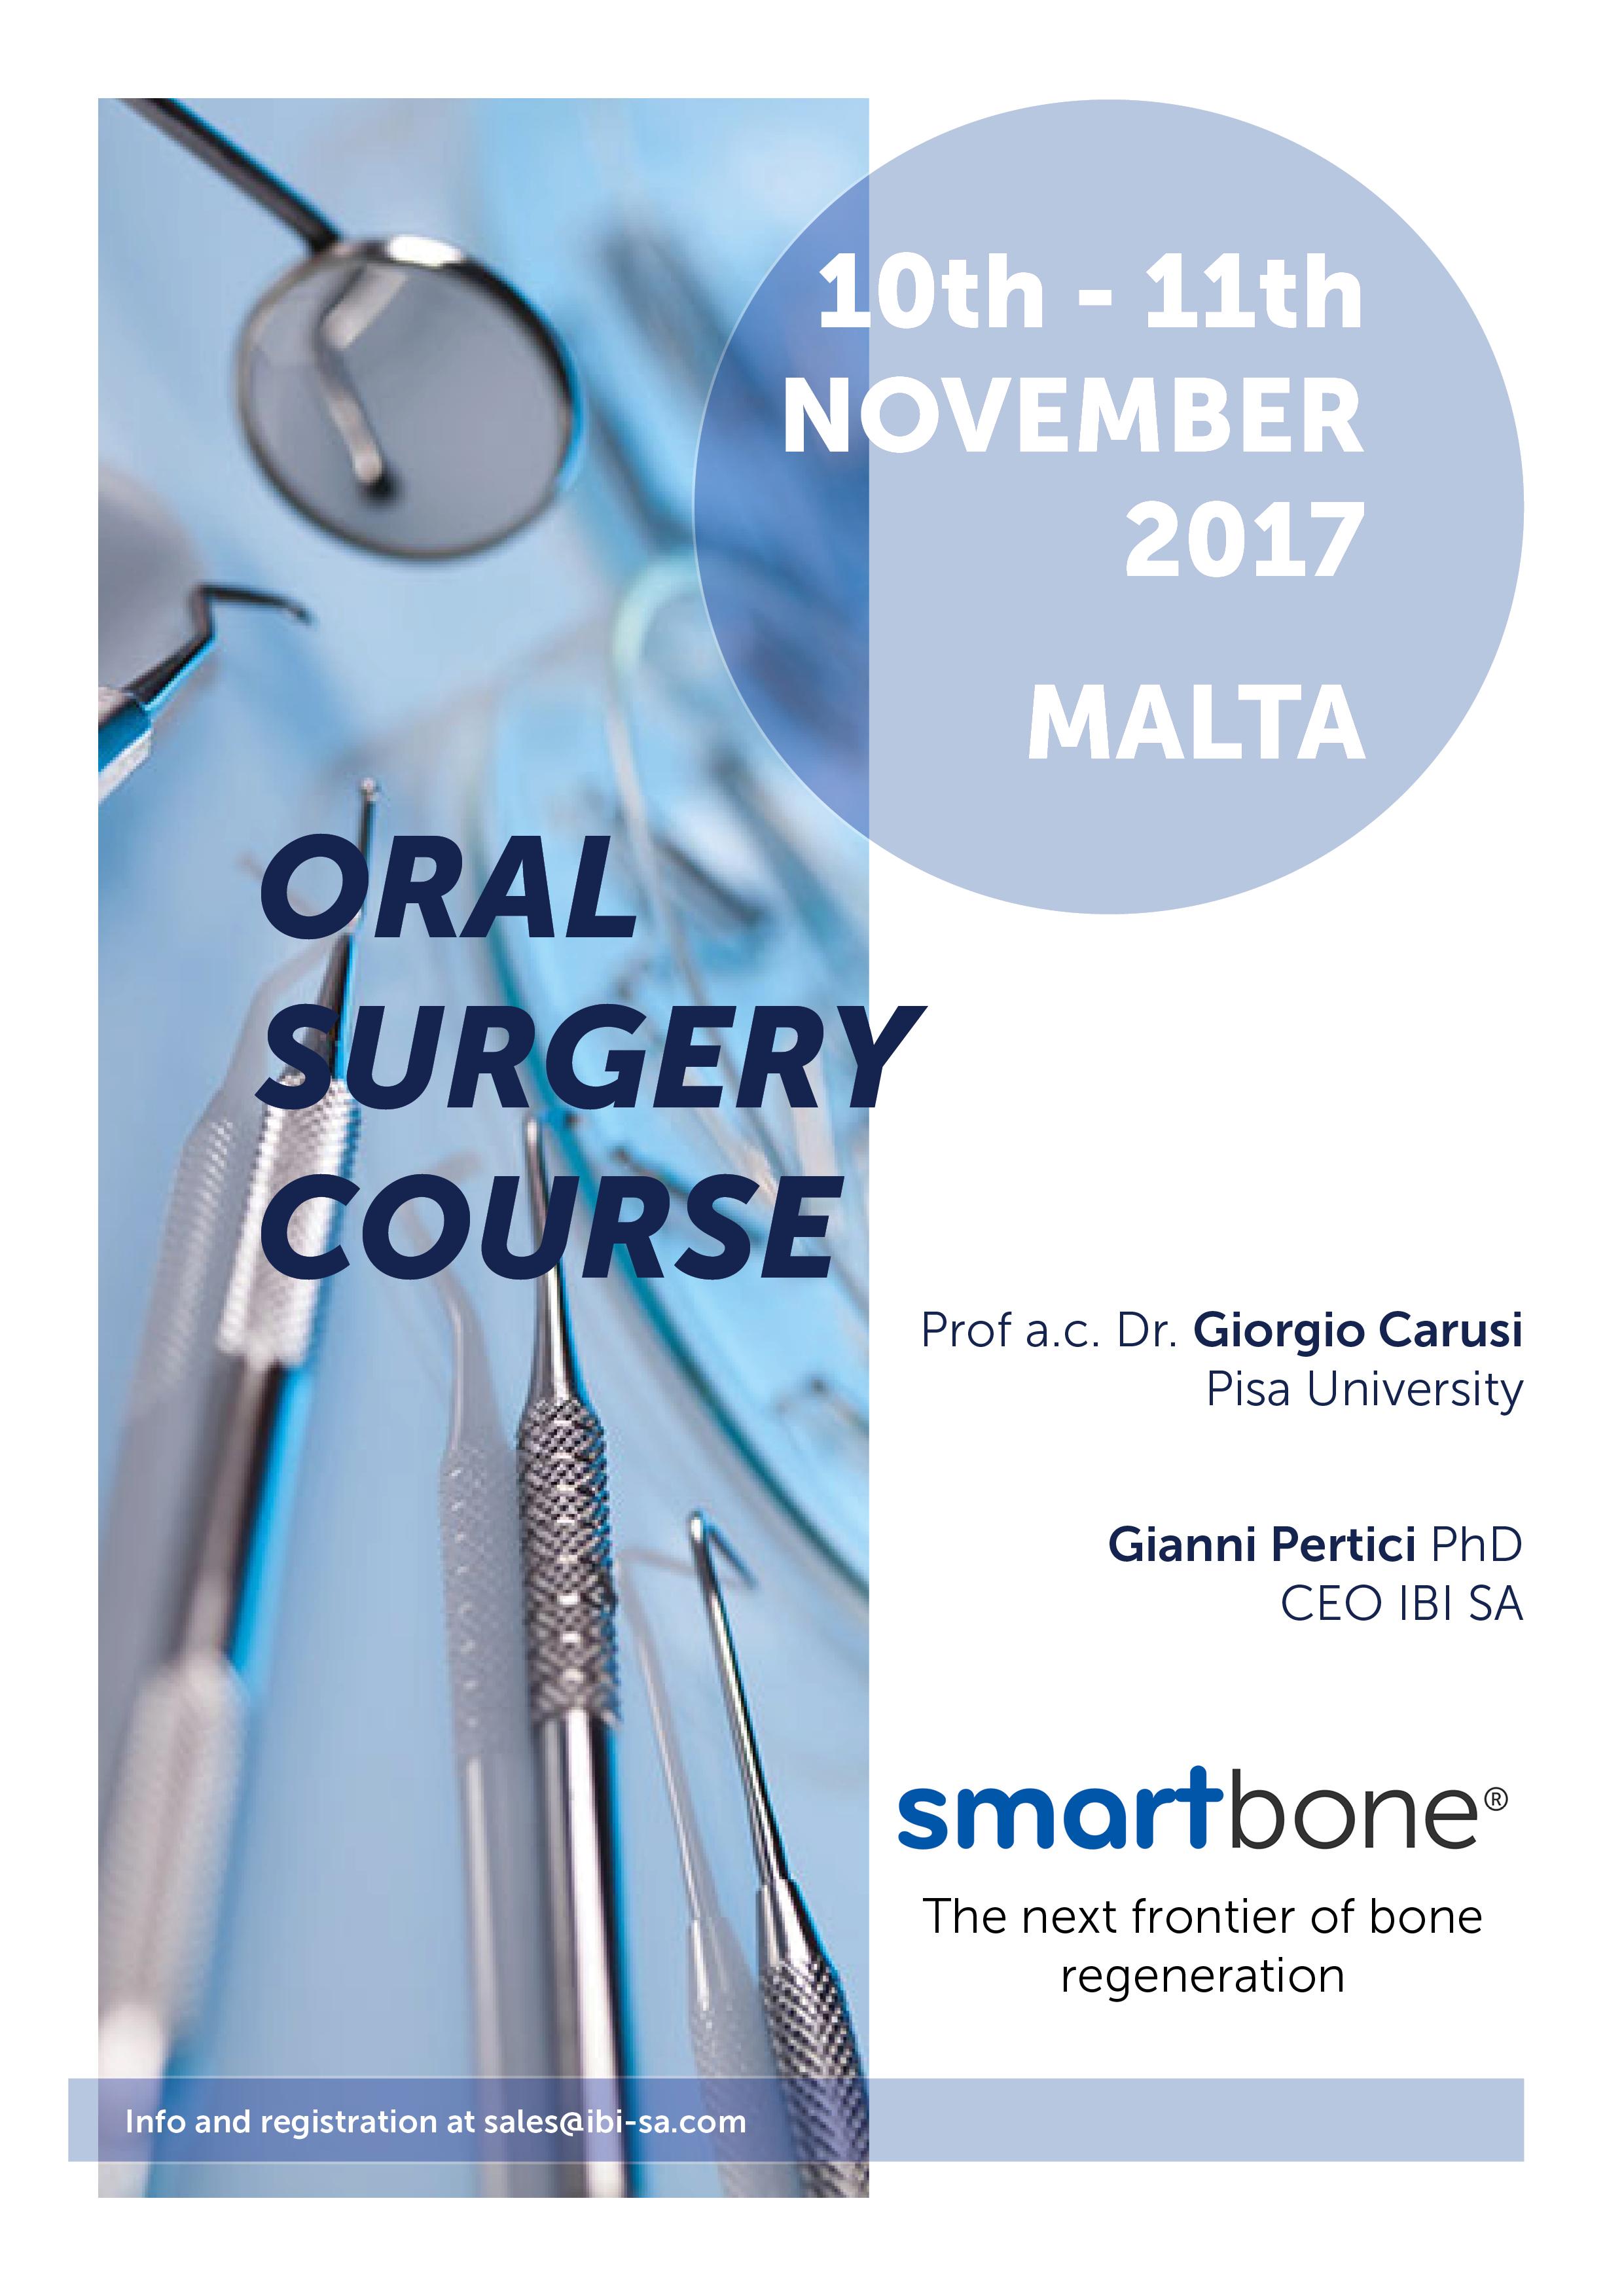 SmartBone® Oral surgery course malta